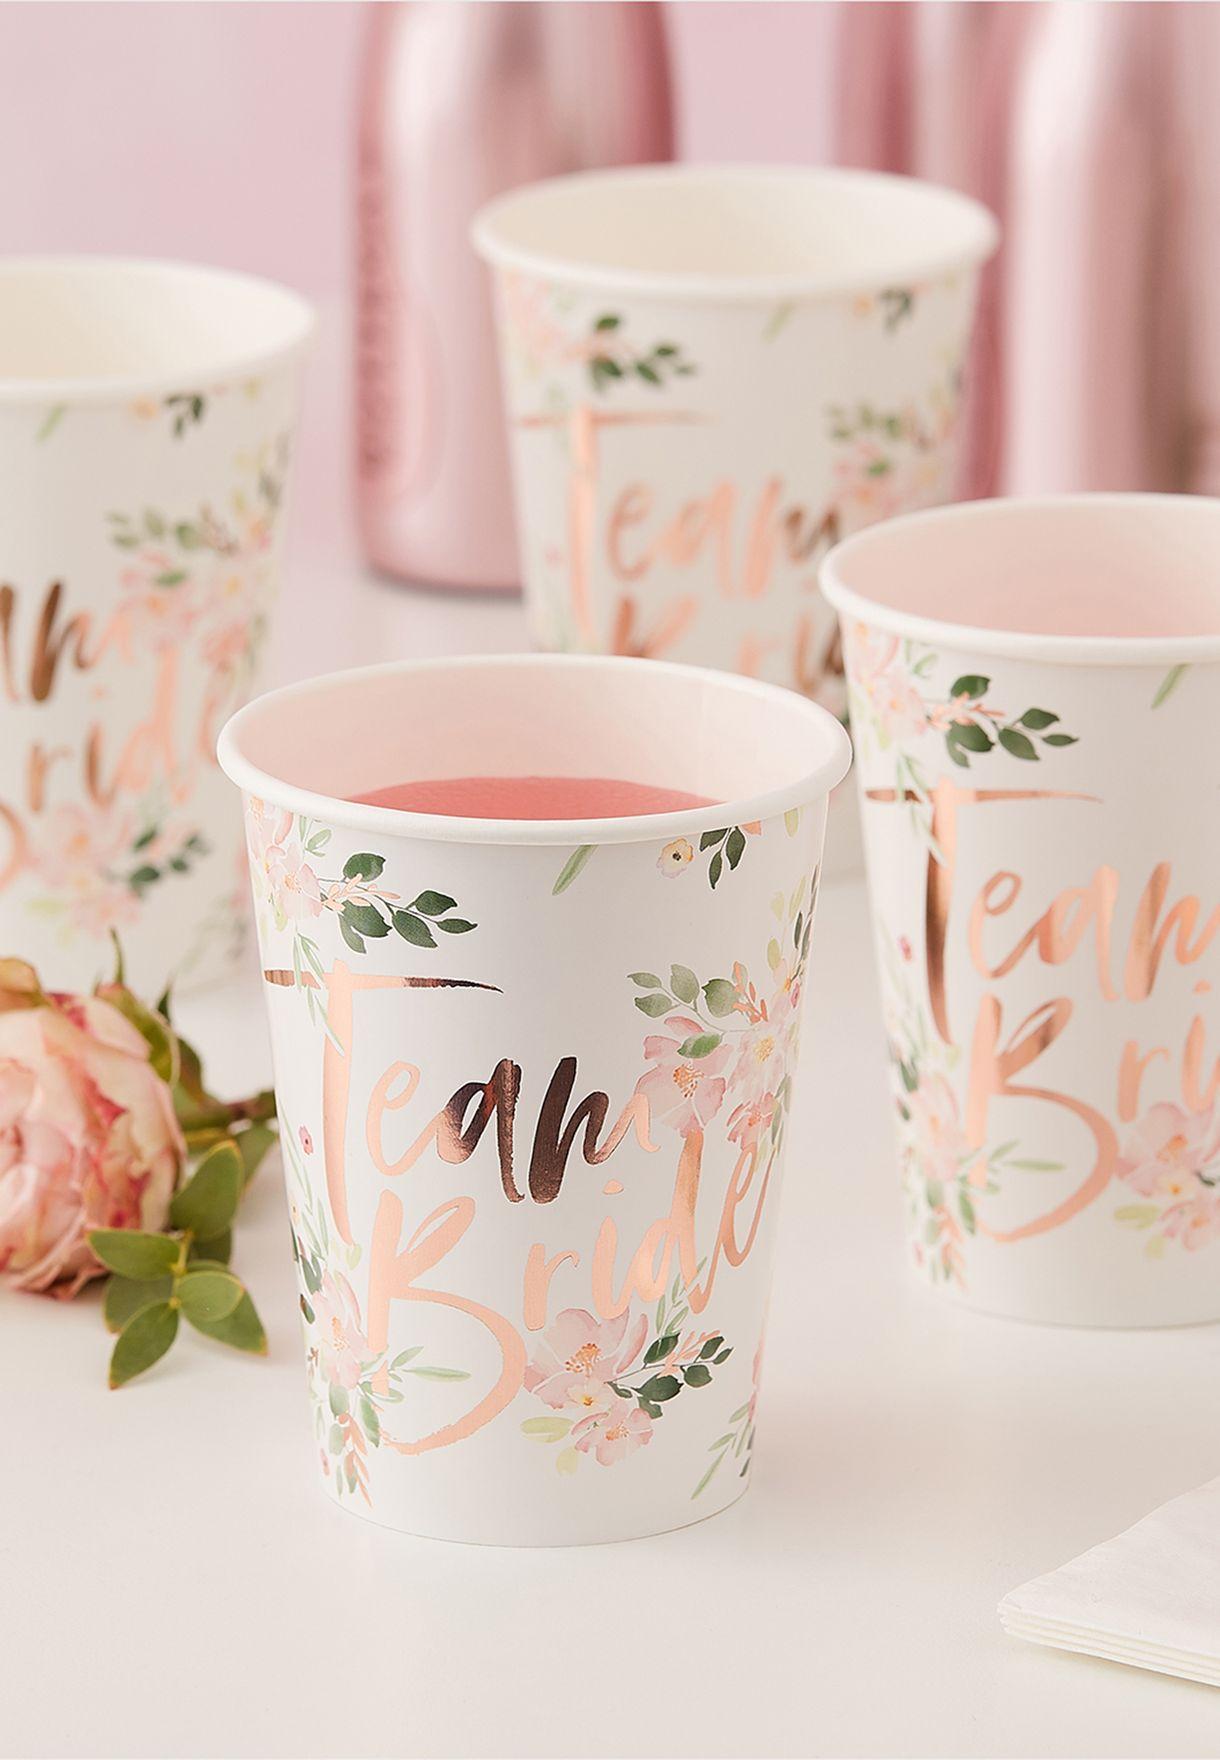 Team Bride Floral Cups 8 Pack